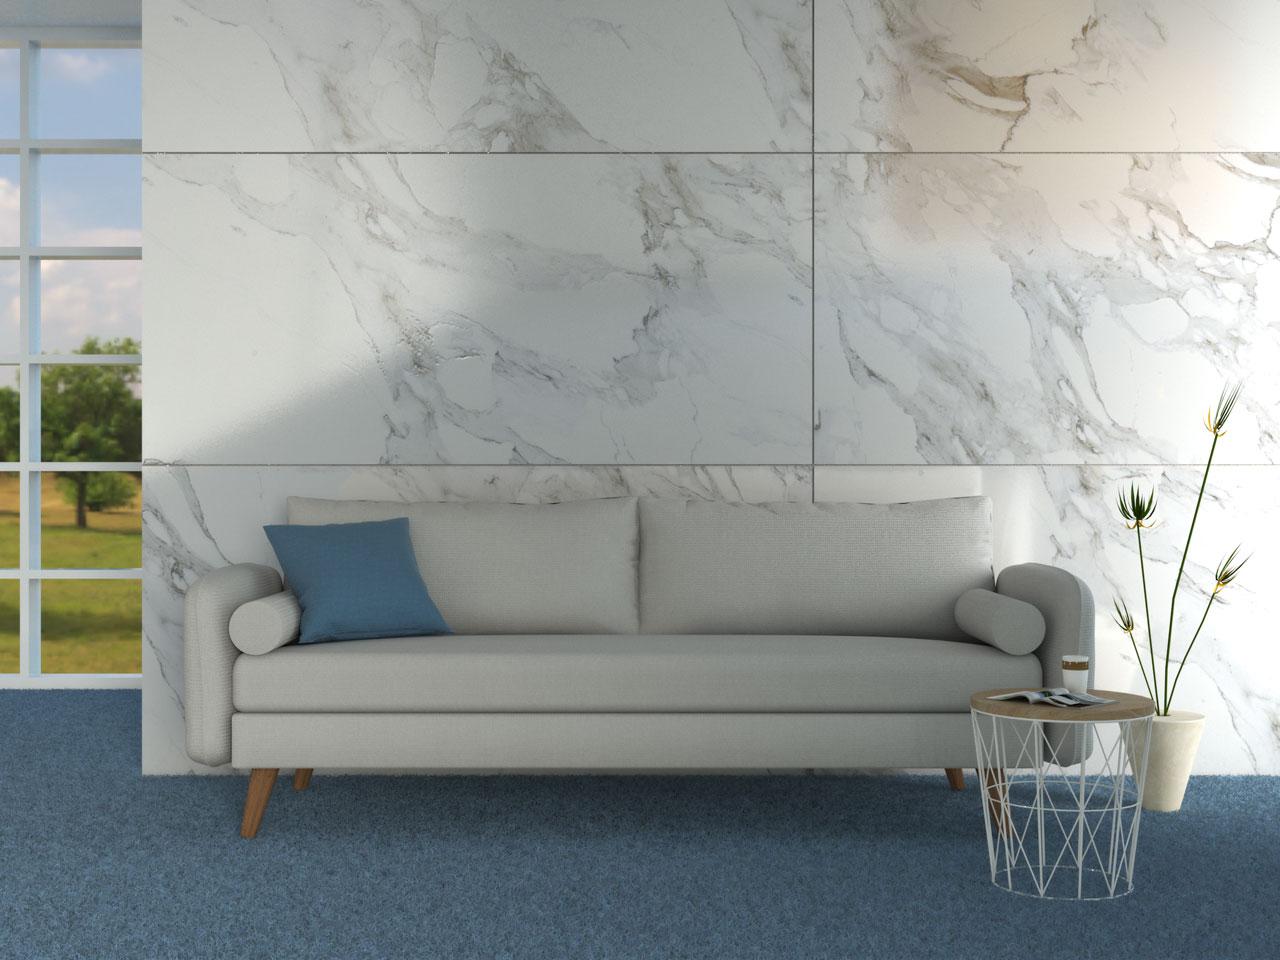 Light gray couch above blue carpet flooring